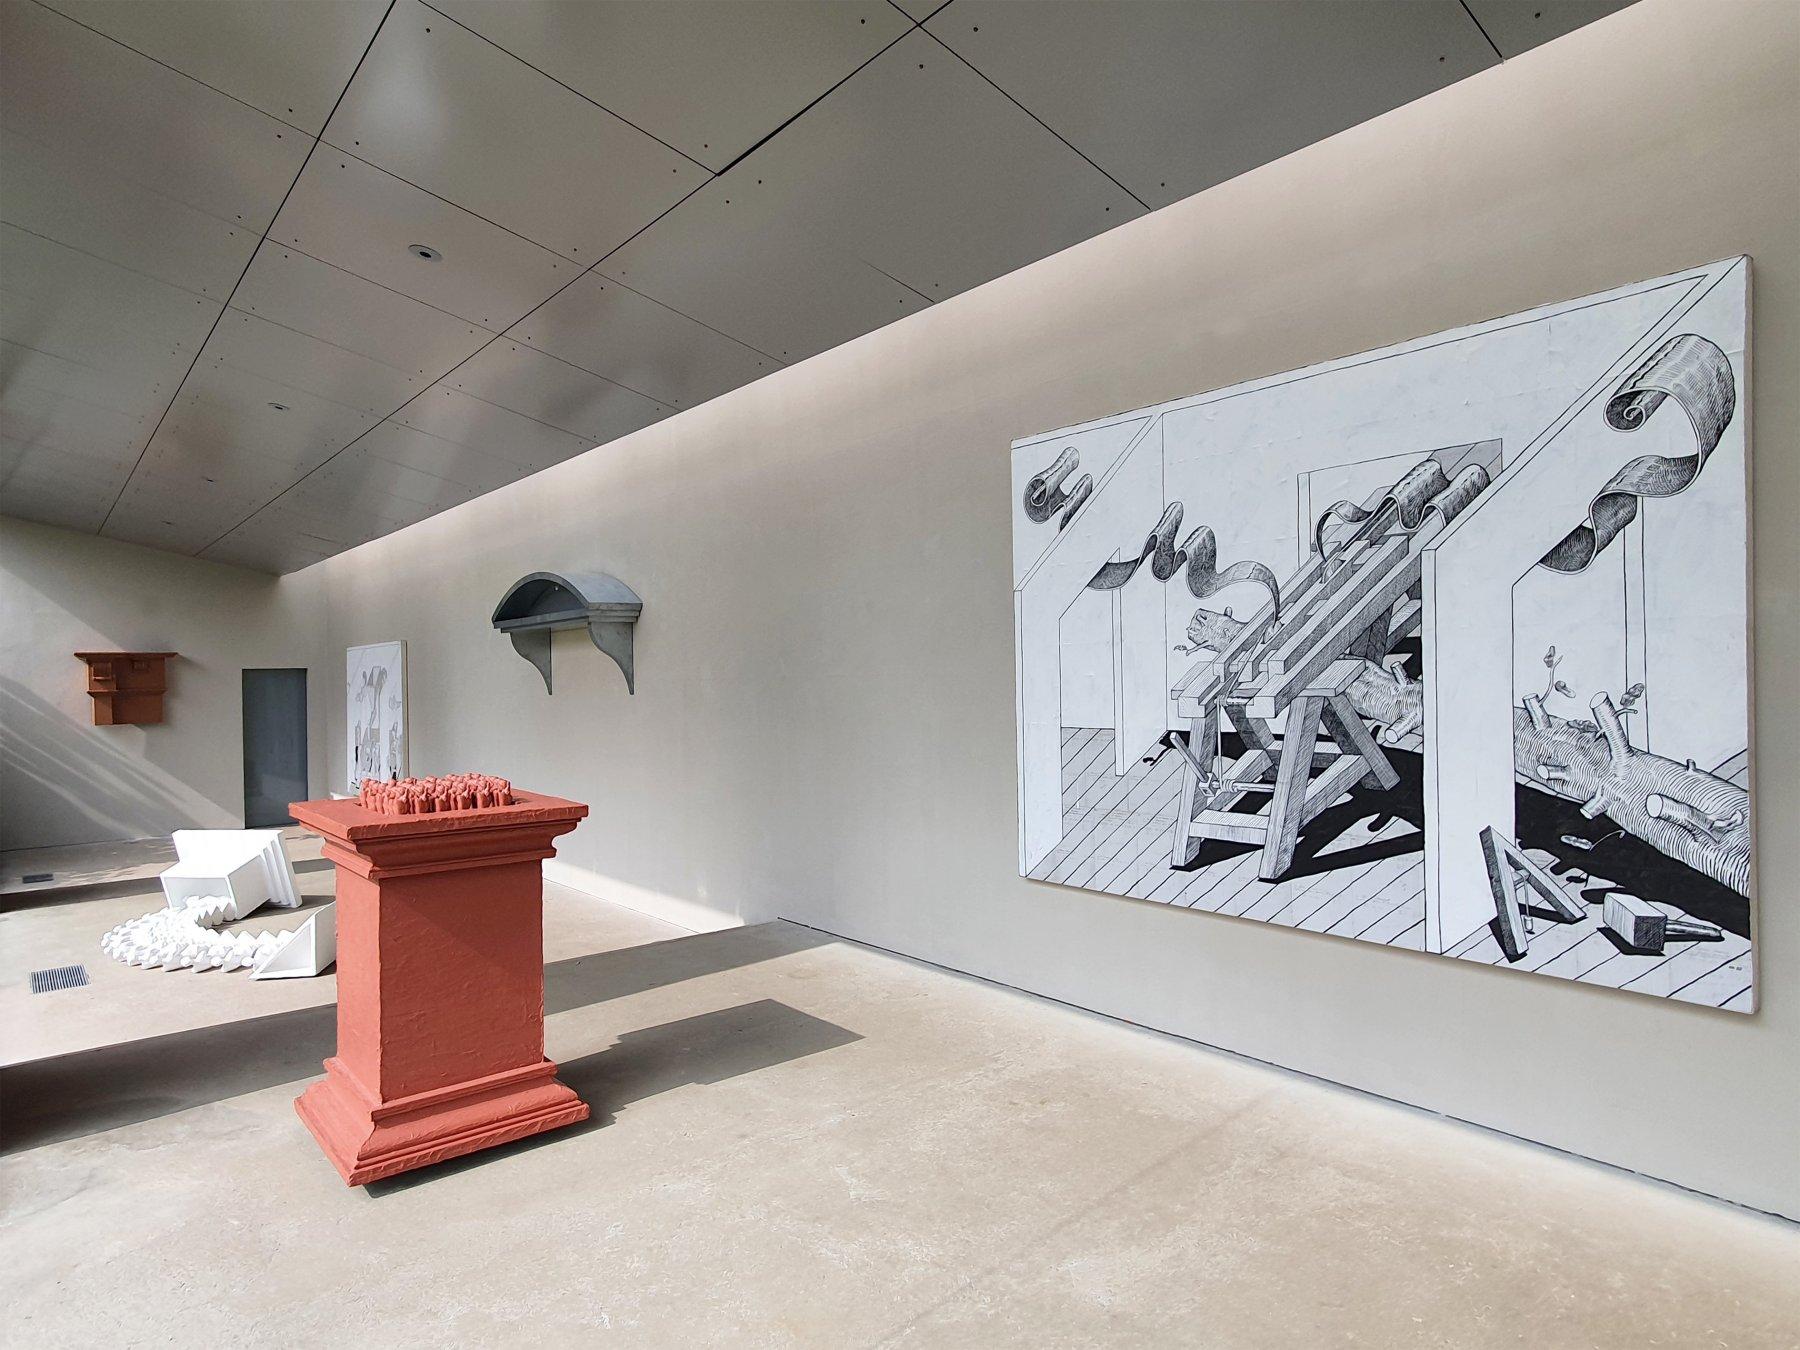 New Art Centre Edward Allington Nika Neelova 1